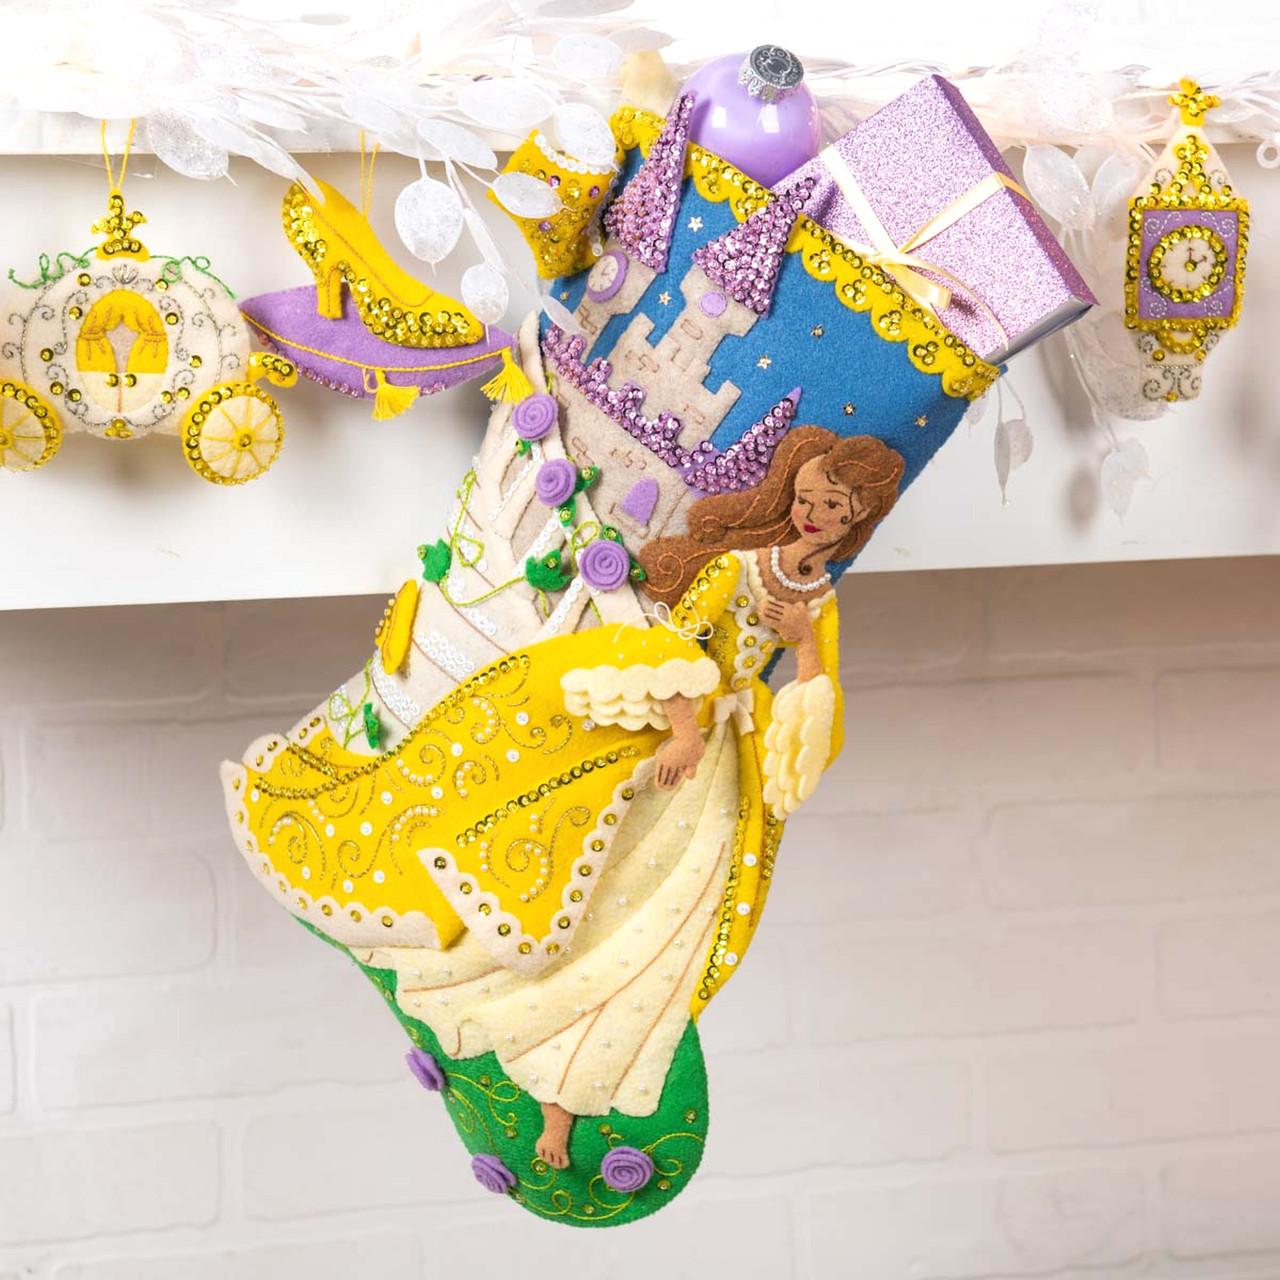 Plaid / Bucilla - The Glass Slipper Christmas Stocking